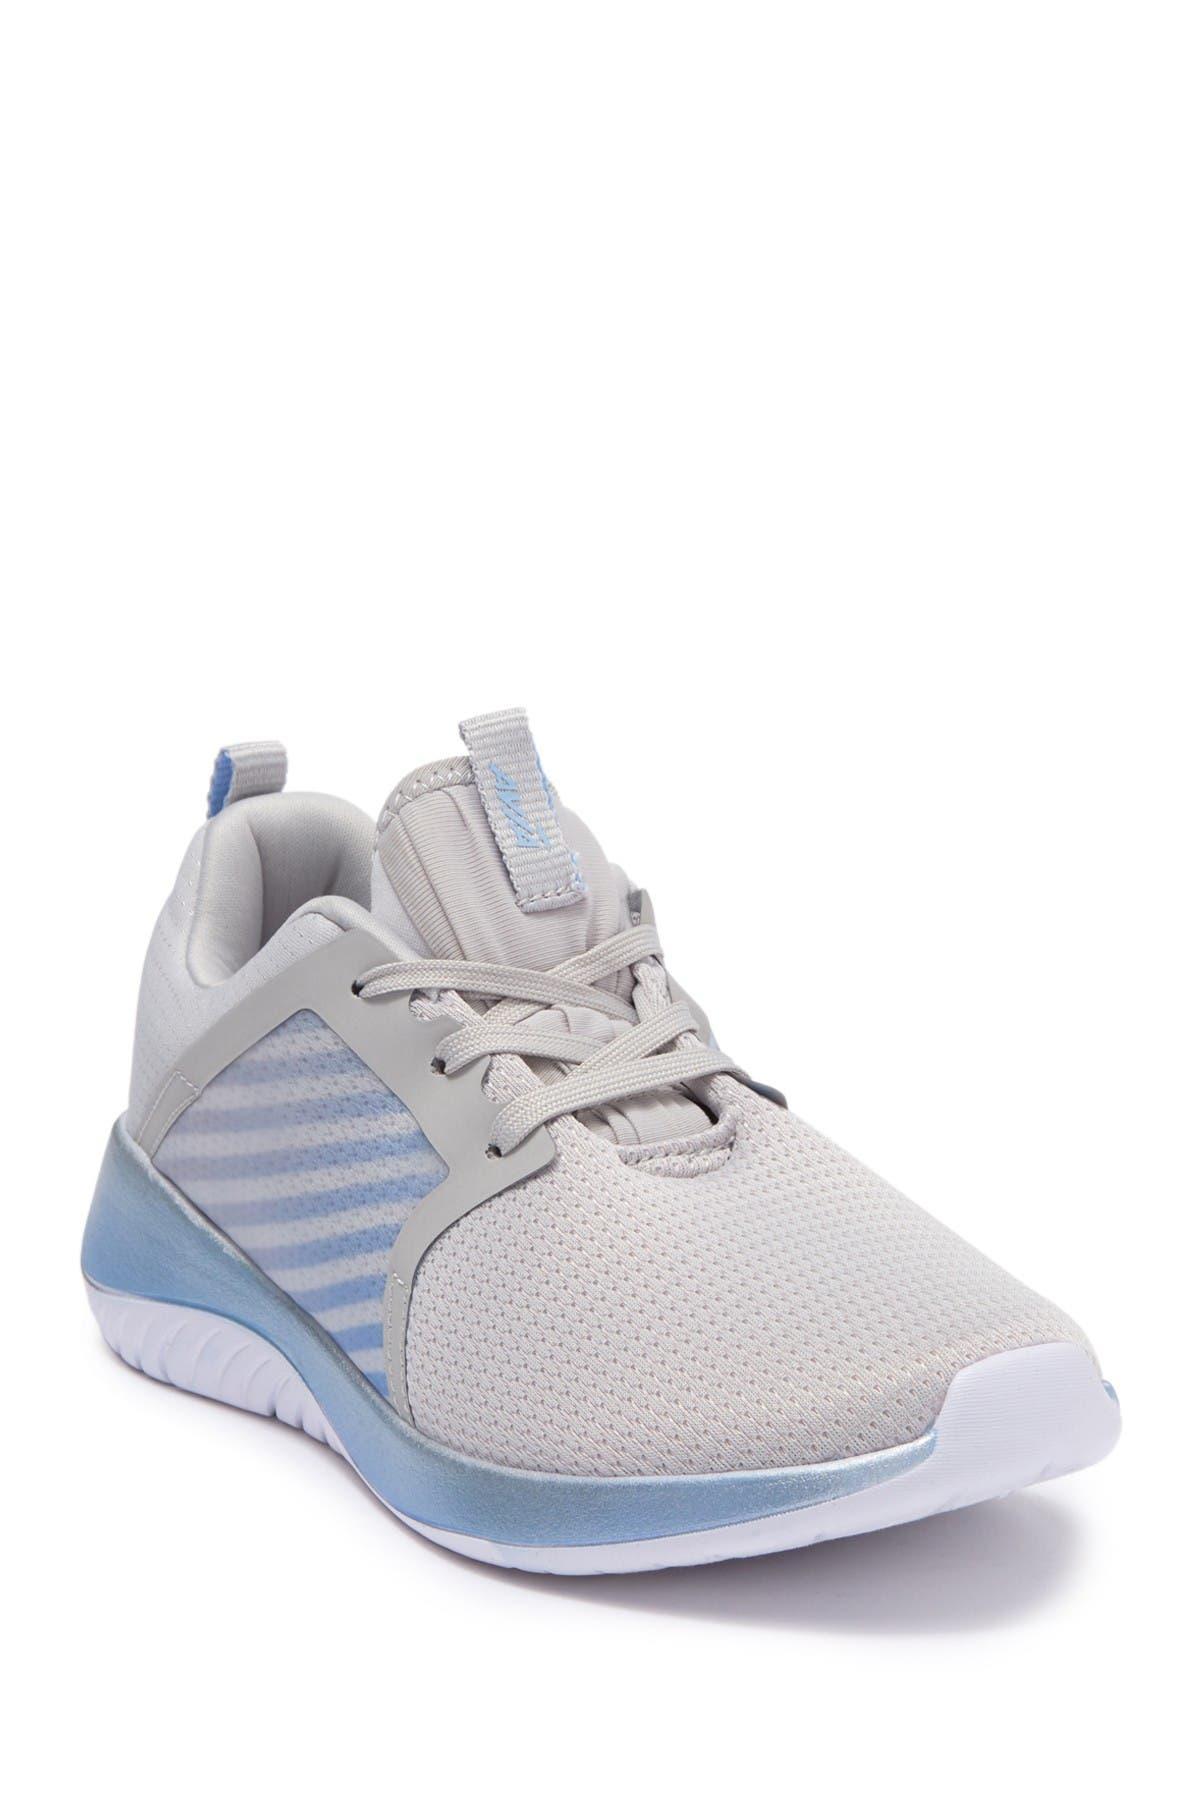 Image of AVIA Avi Coast Sneaker